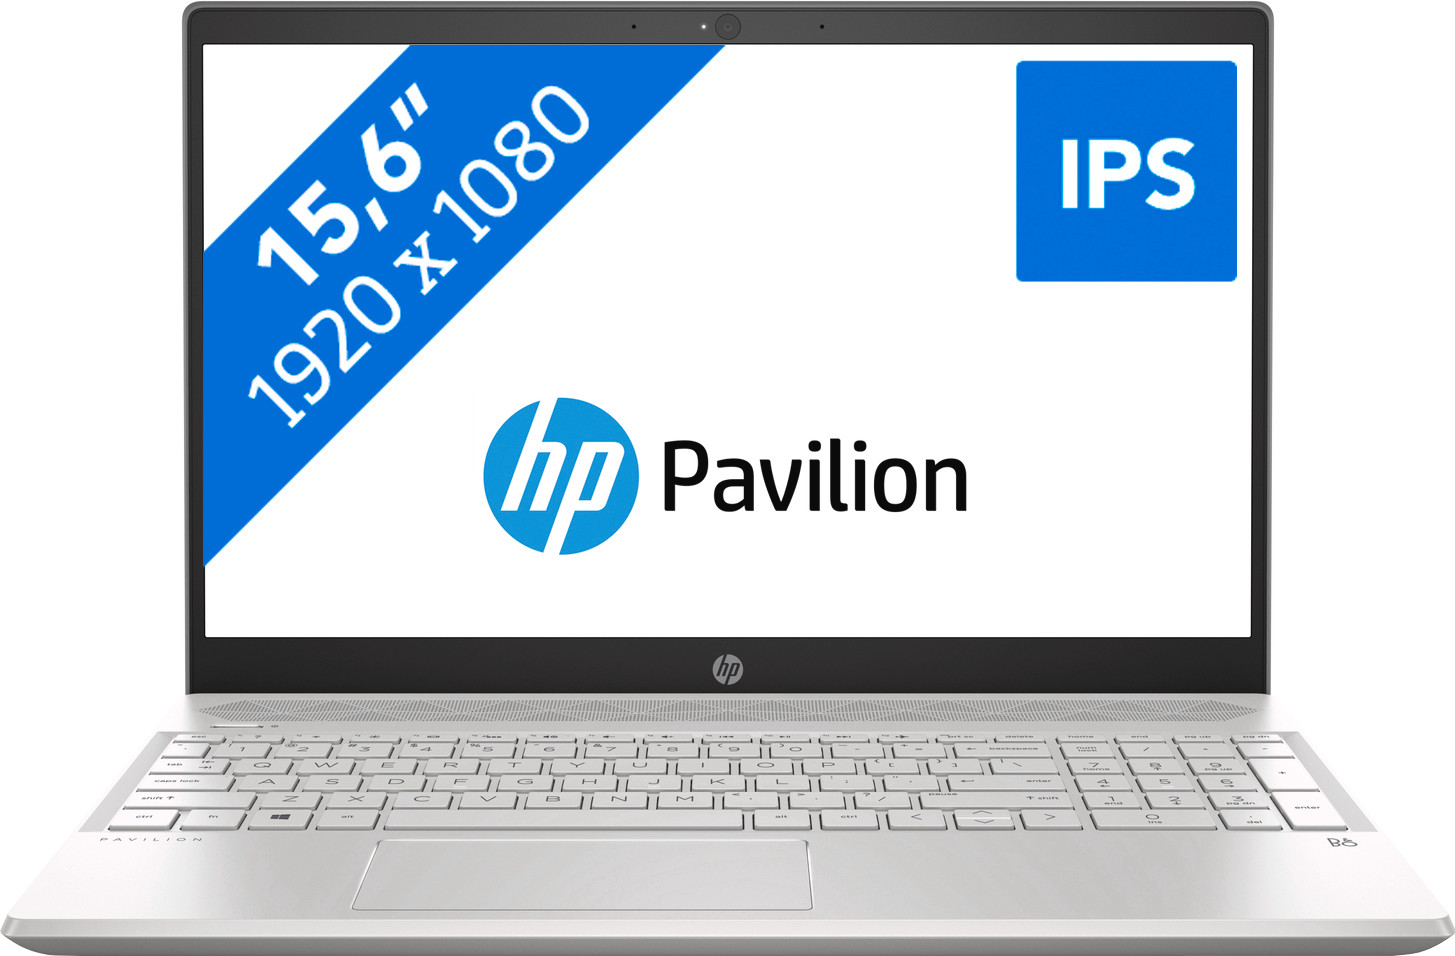 HP Pavilion - beste laptop voor videobewerking